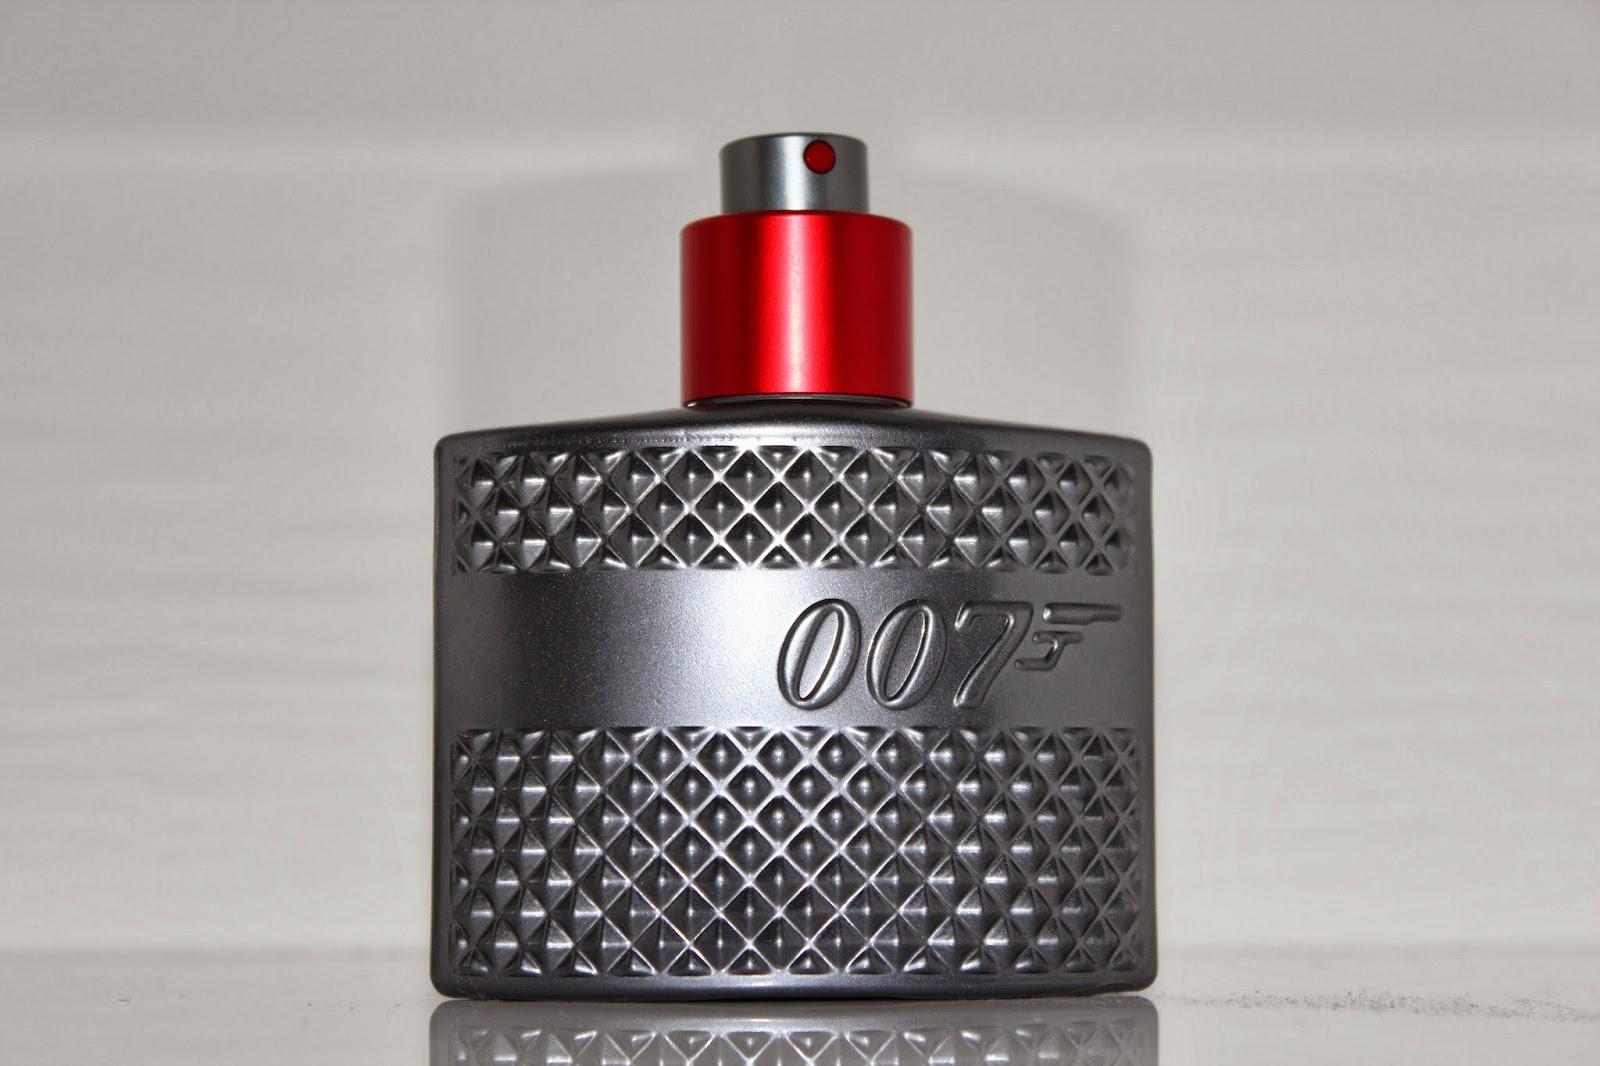 James Bond 007 Quantum fragrance review!